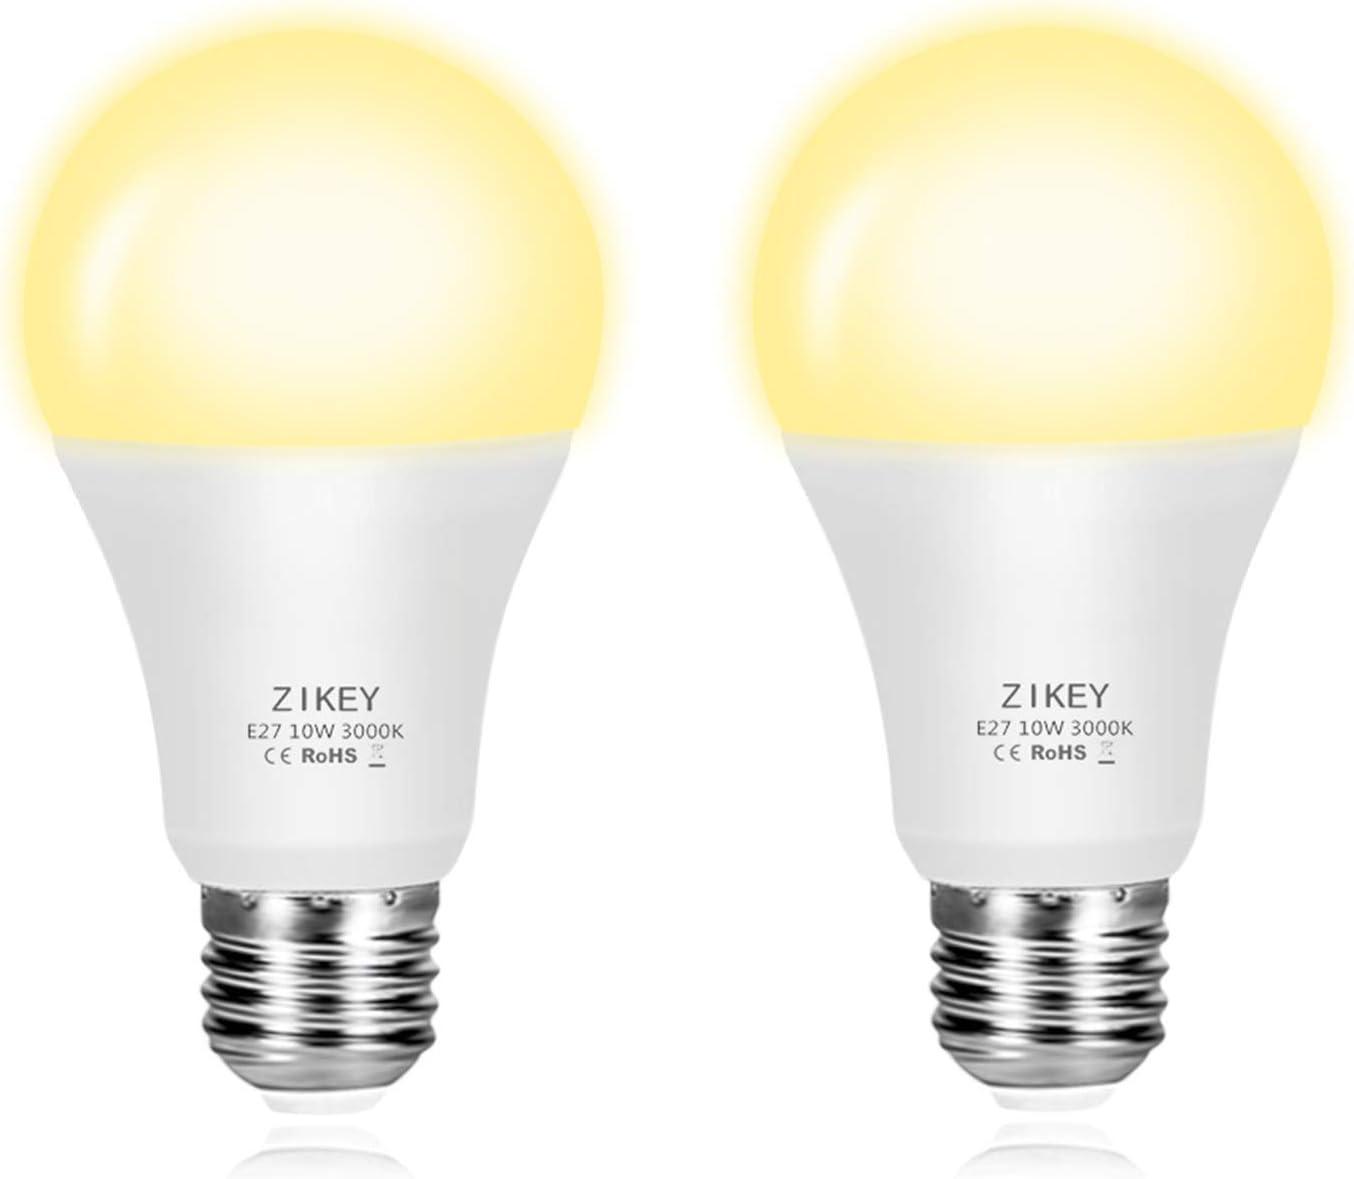 ZIKEY Bombilla Sensor Crepuscular, E27 10W Bombilla Led de Luz Sensor Dia y Noche encendido/apagado automático, Blanco Cálido 3000K 800lm - 2 Unidades